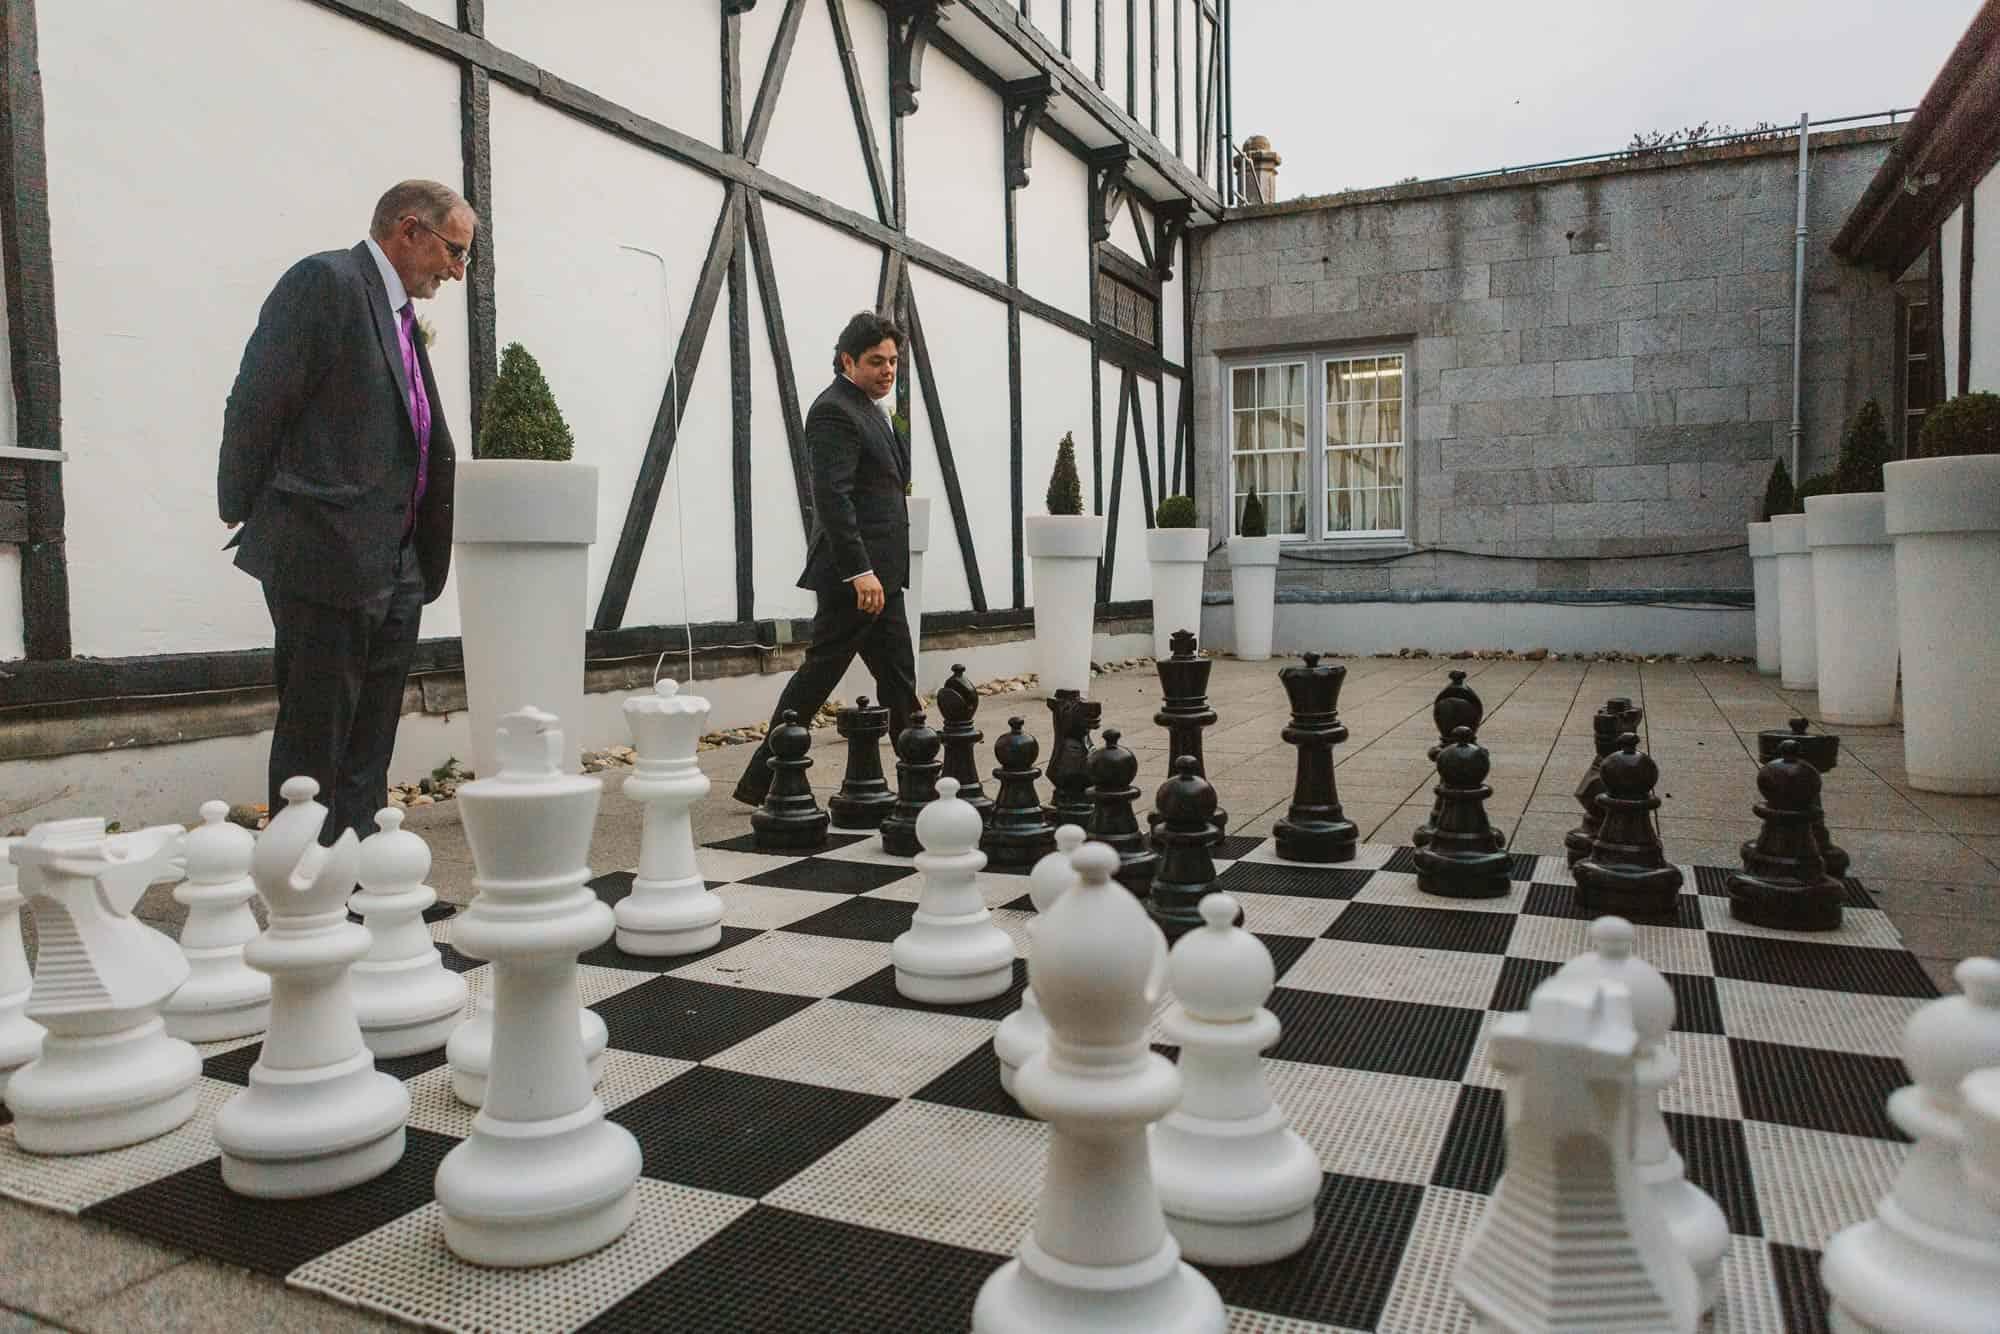 chess in Dromoland Castle Ireland